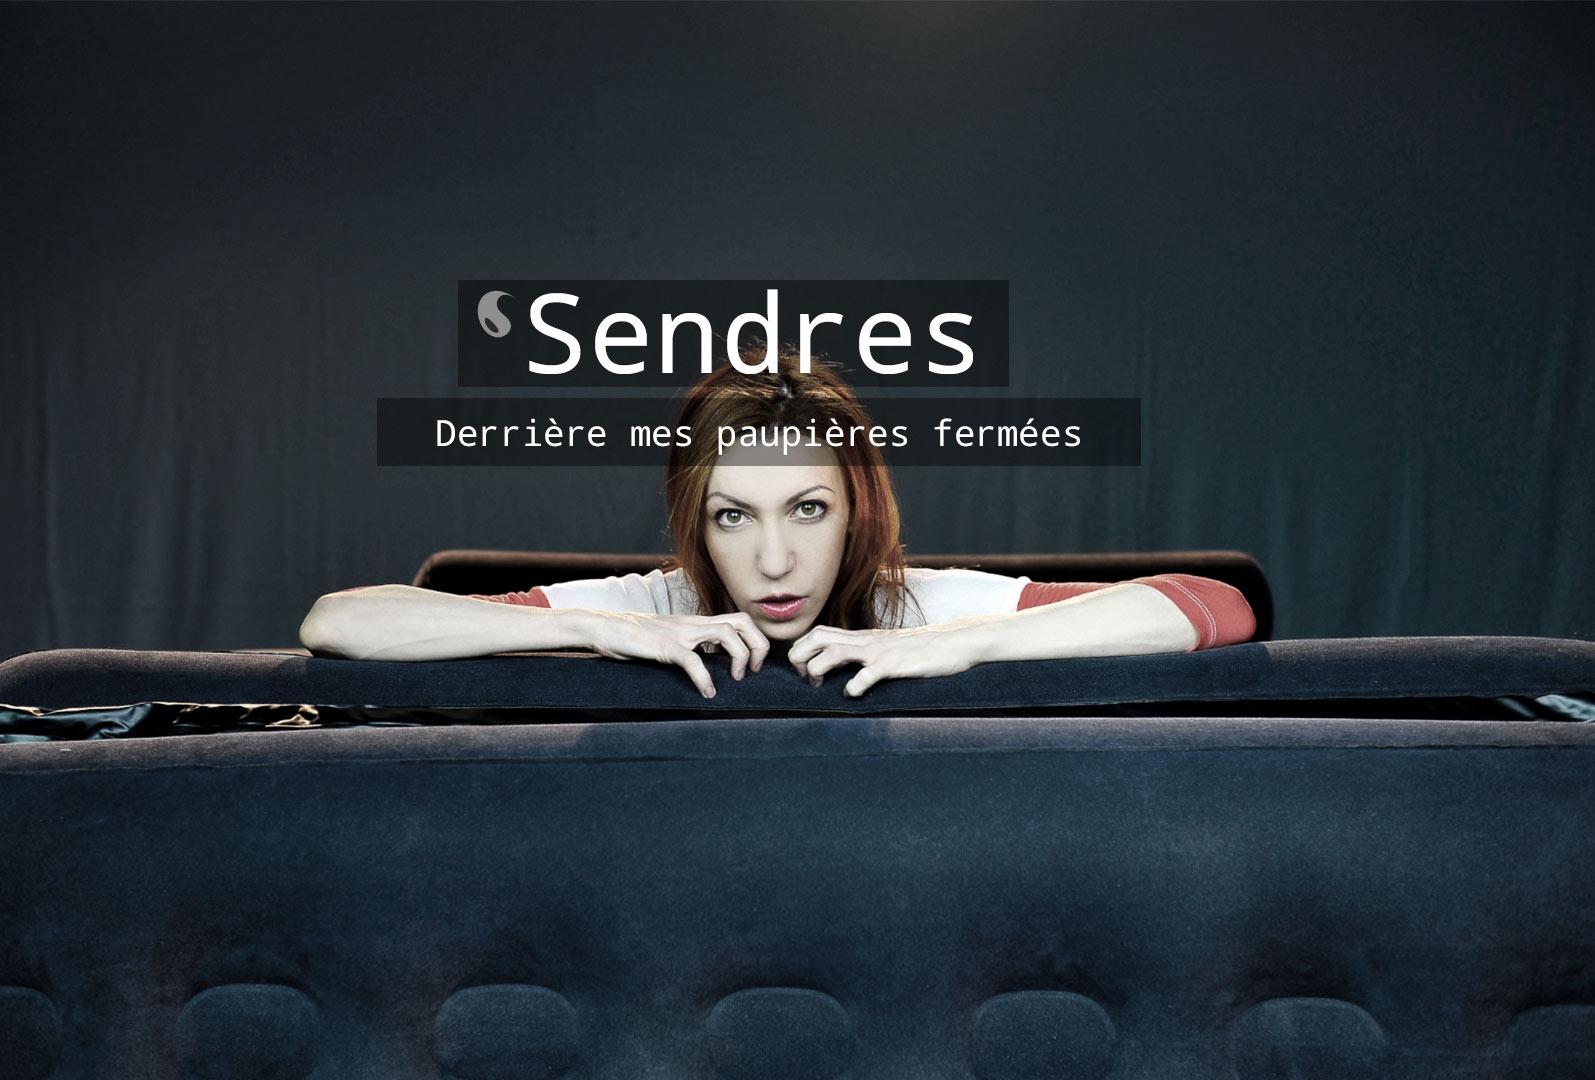 Sendres